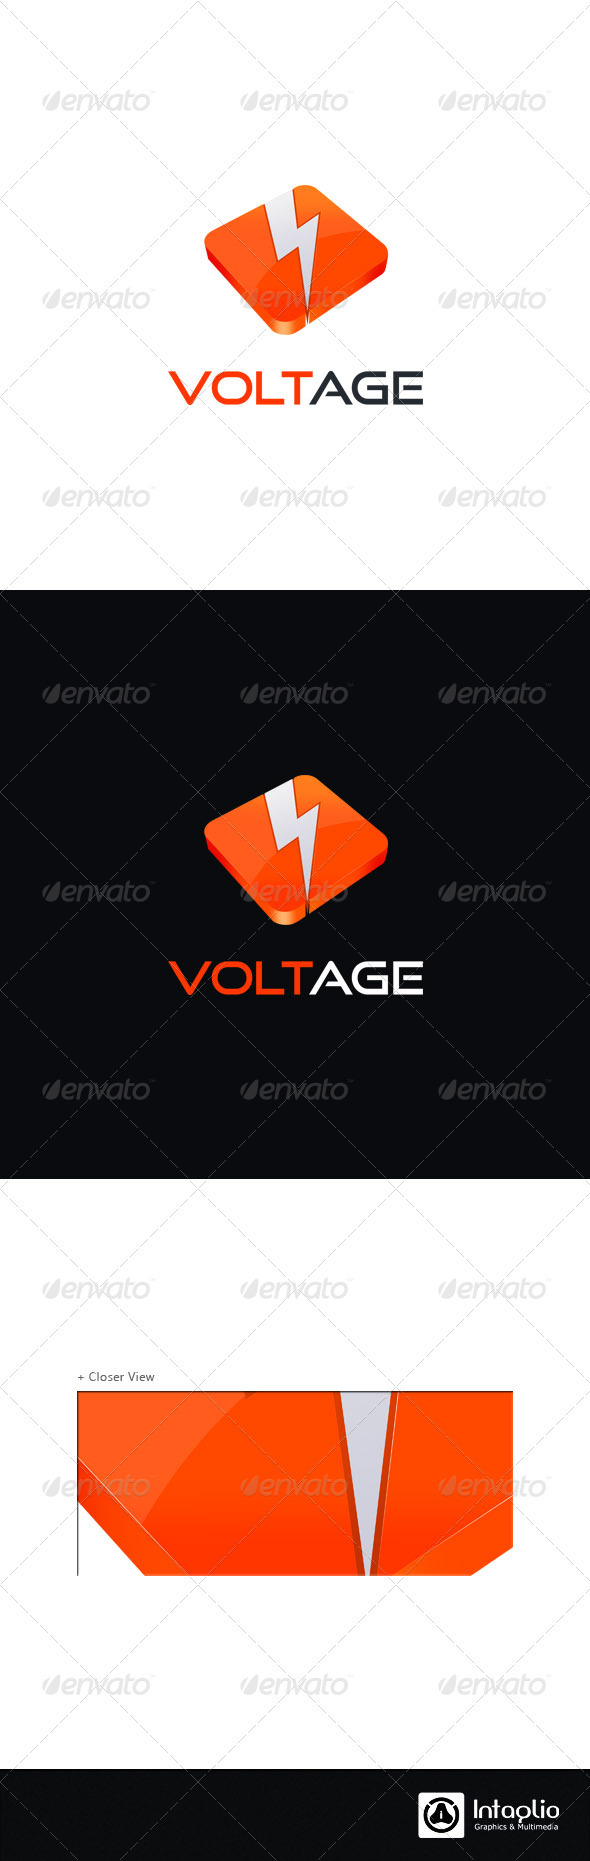 Creative 3D Logo - Voltage